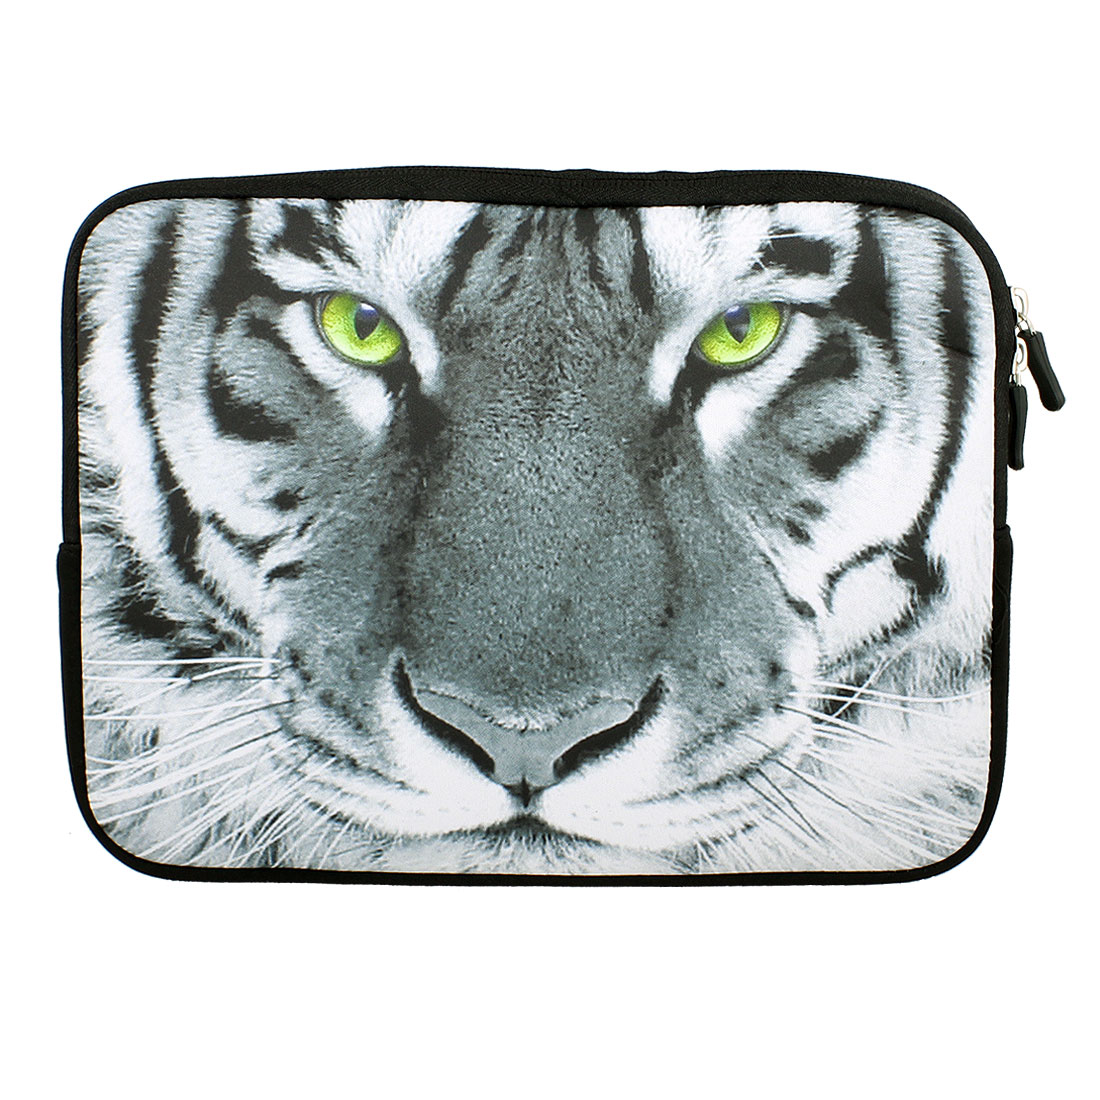 "Tiger Print 10"" 10.1"" 10.2"" Neoprene Notebook Laptop Sleeve Bag Case"